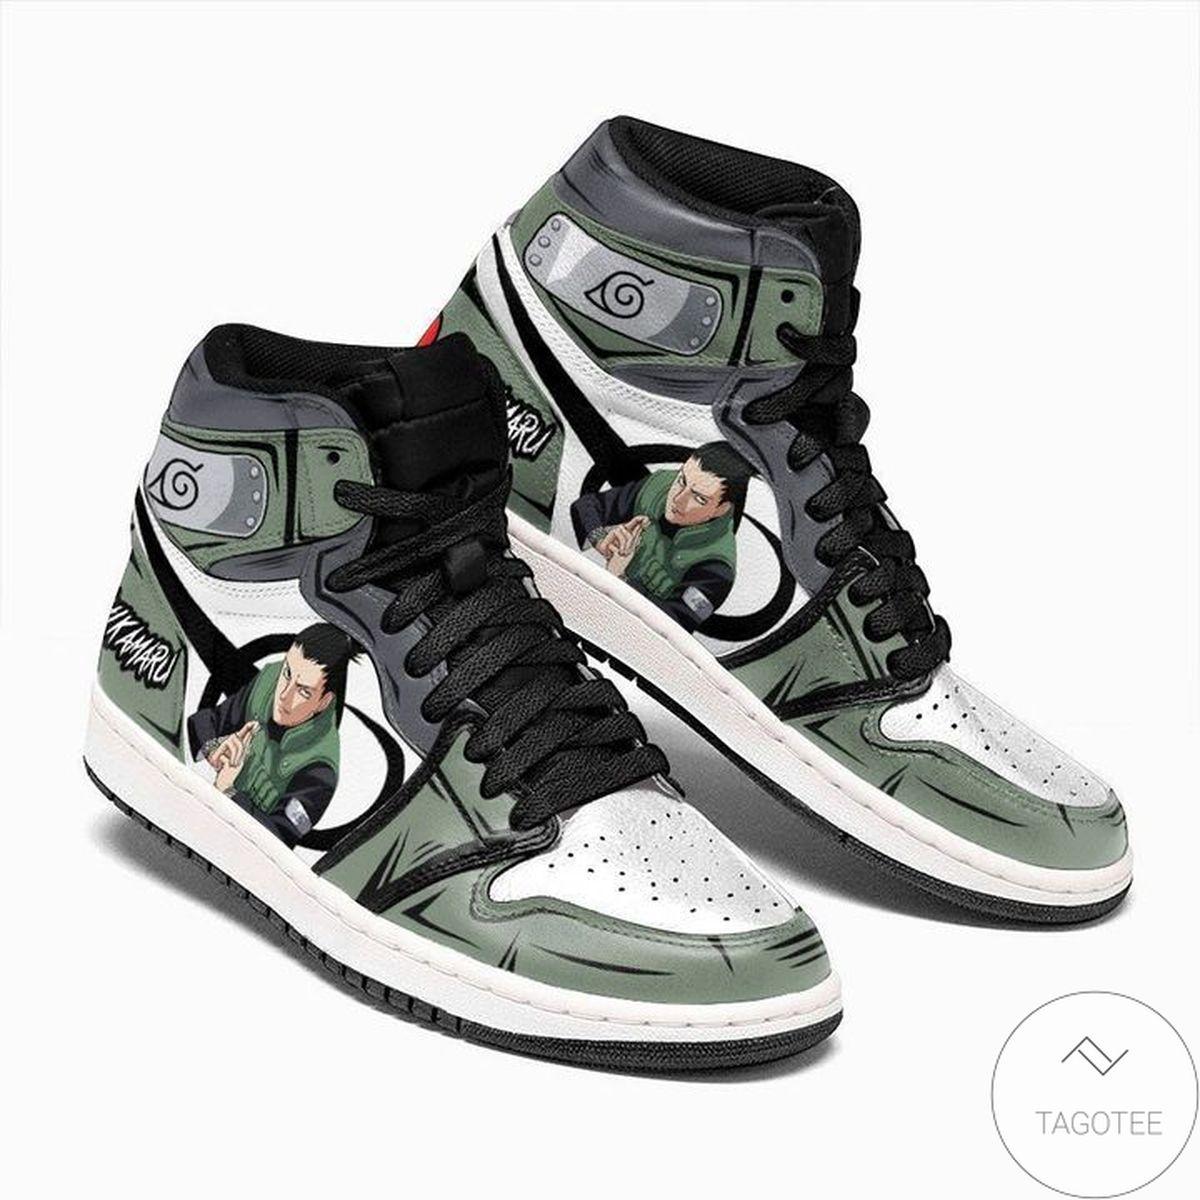 Unique Nara Shikamaru Sneaker Air Jordan High Top Shoes